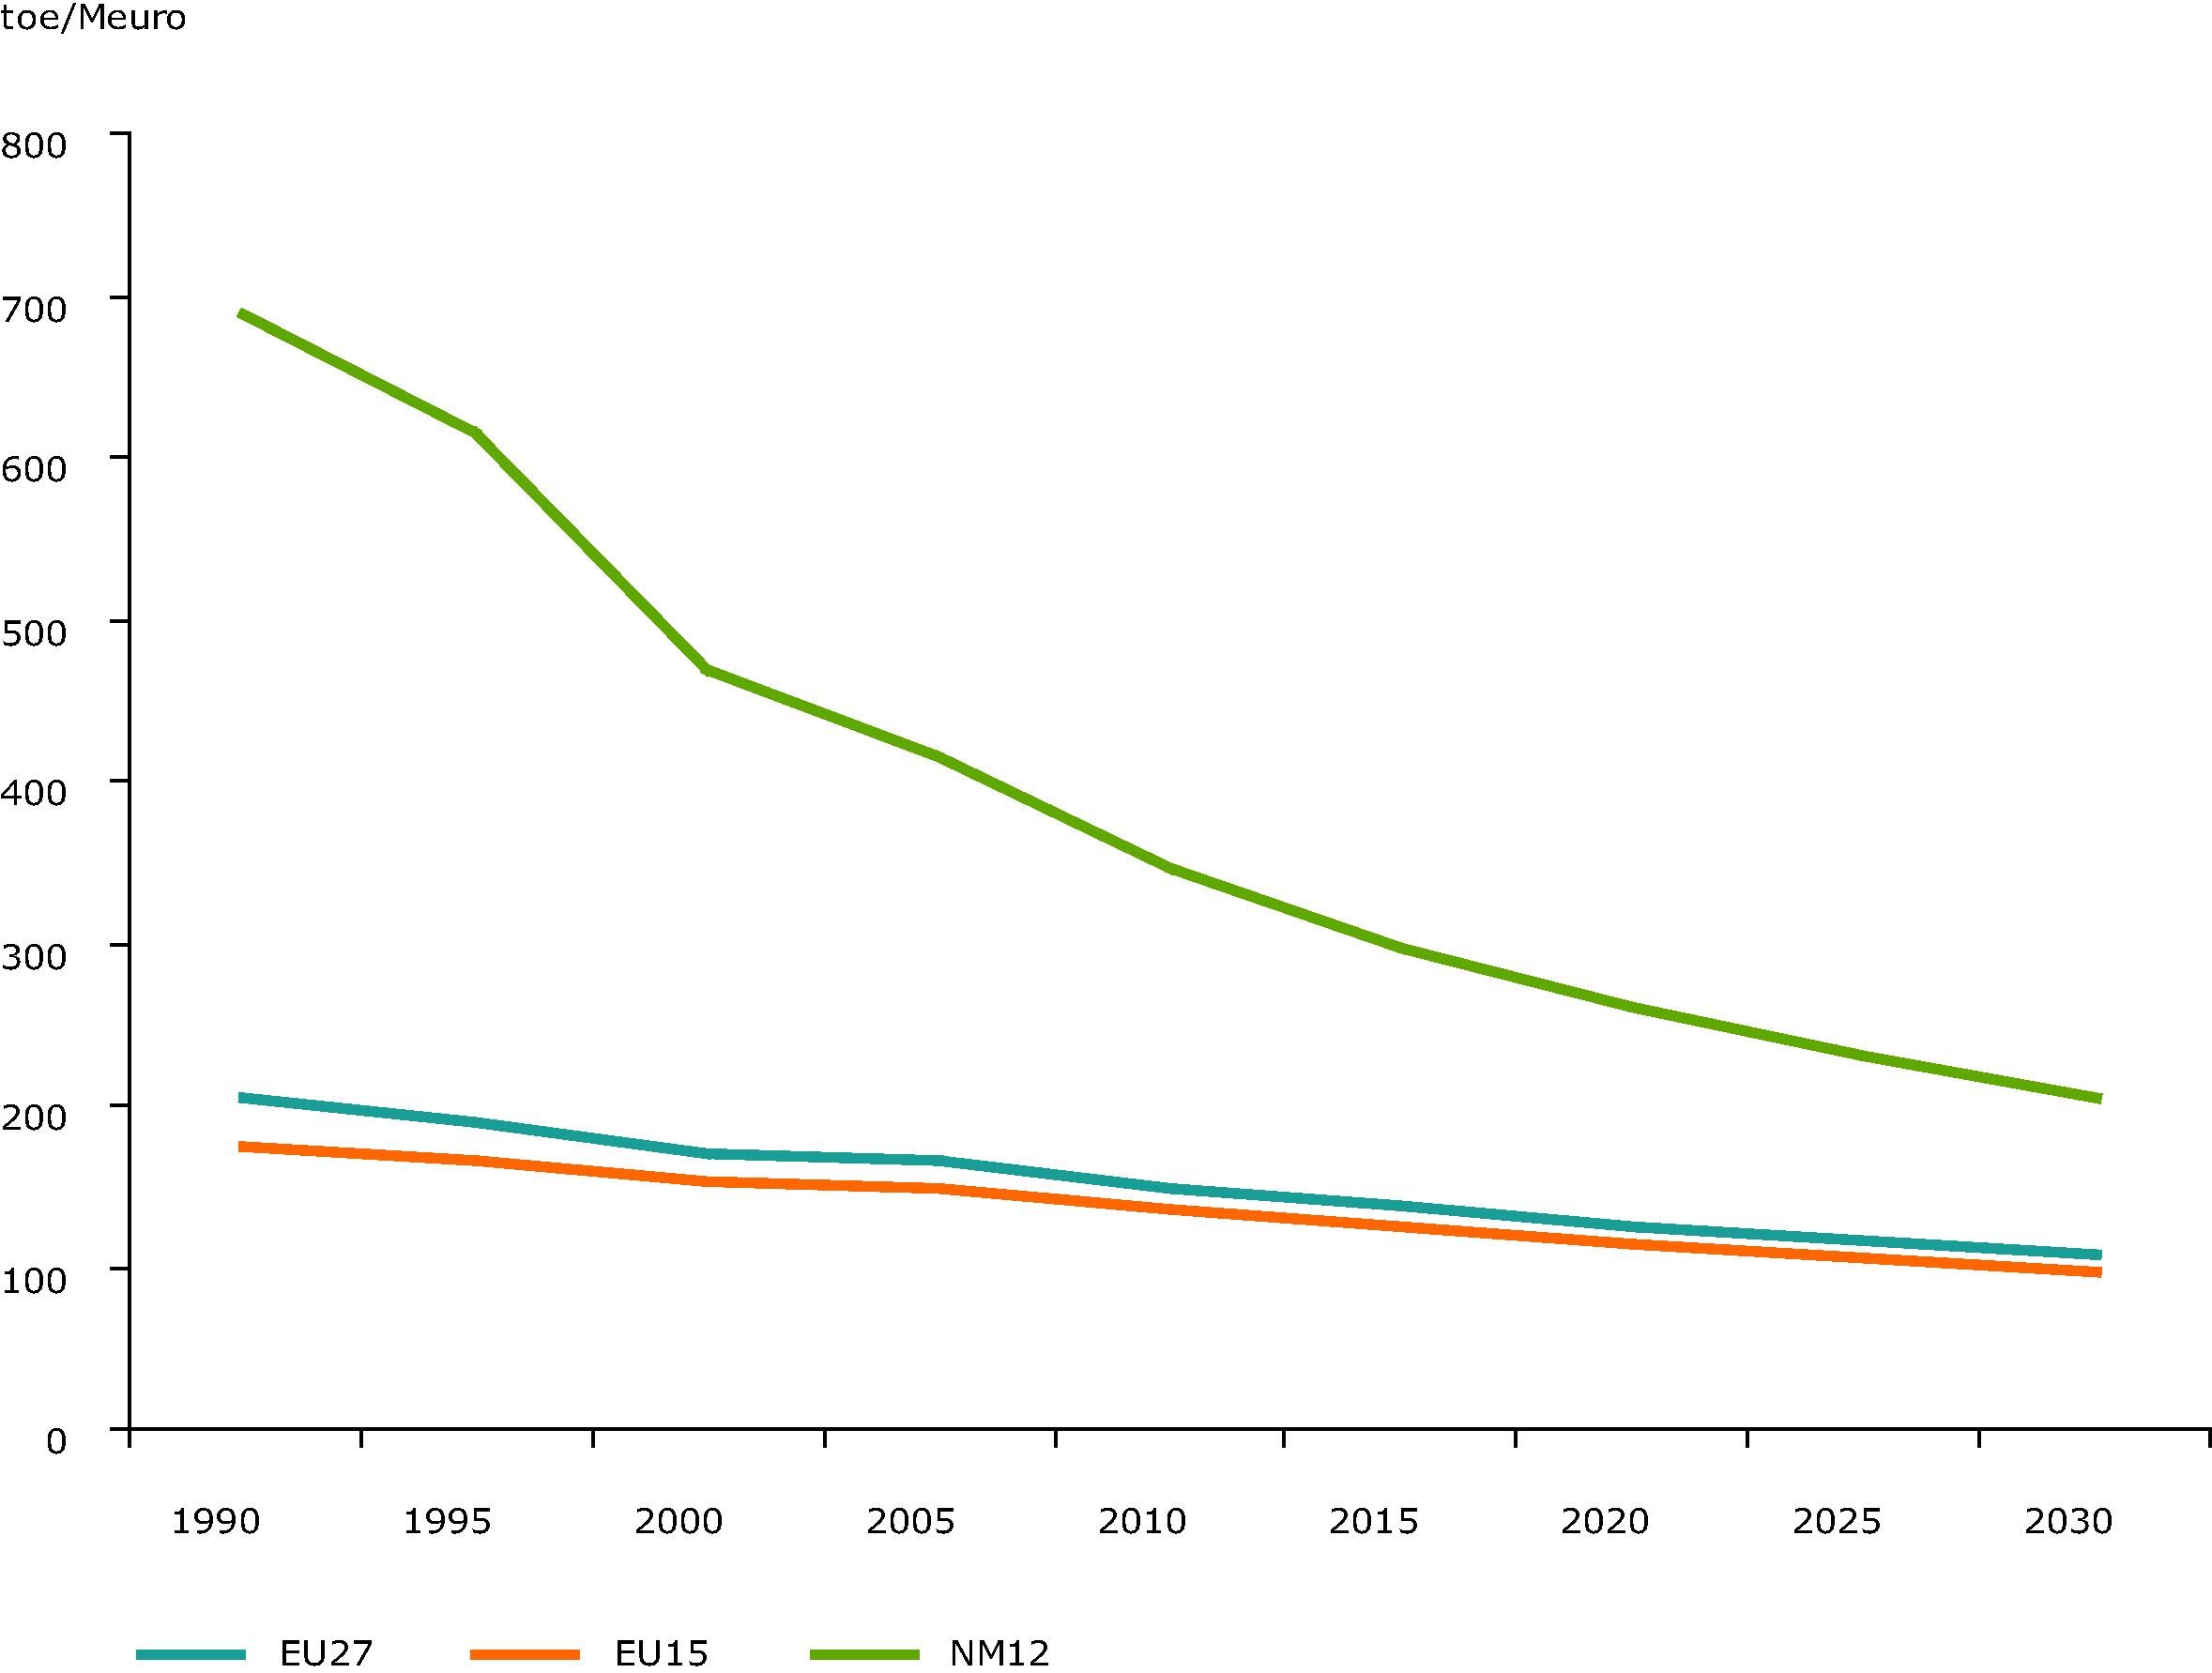 Energy Intensity - Gross Inland consumption per GDP, EU 27